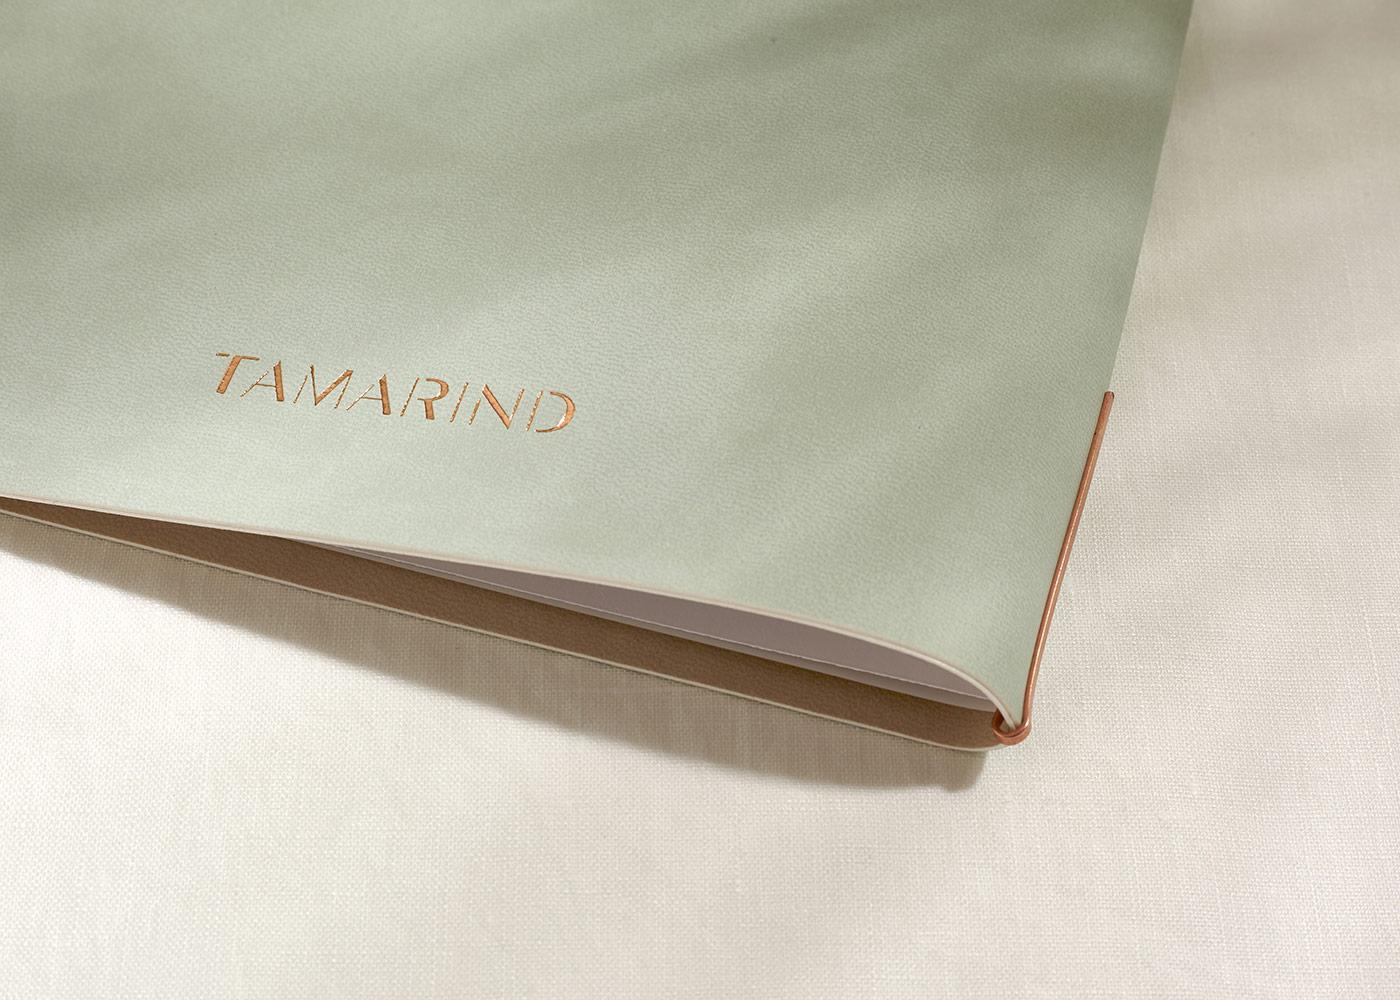 Tamarind identity